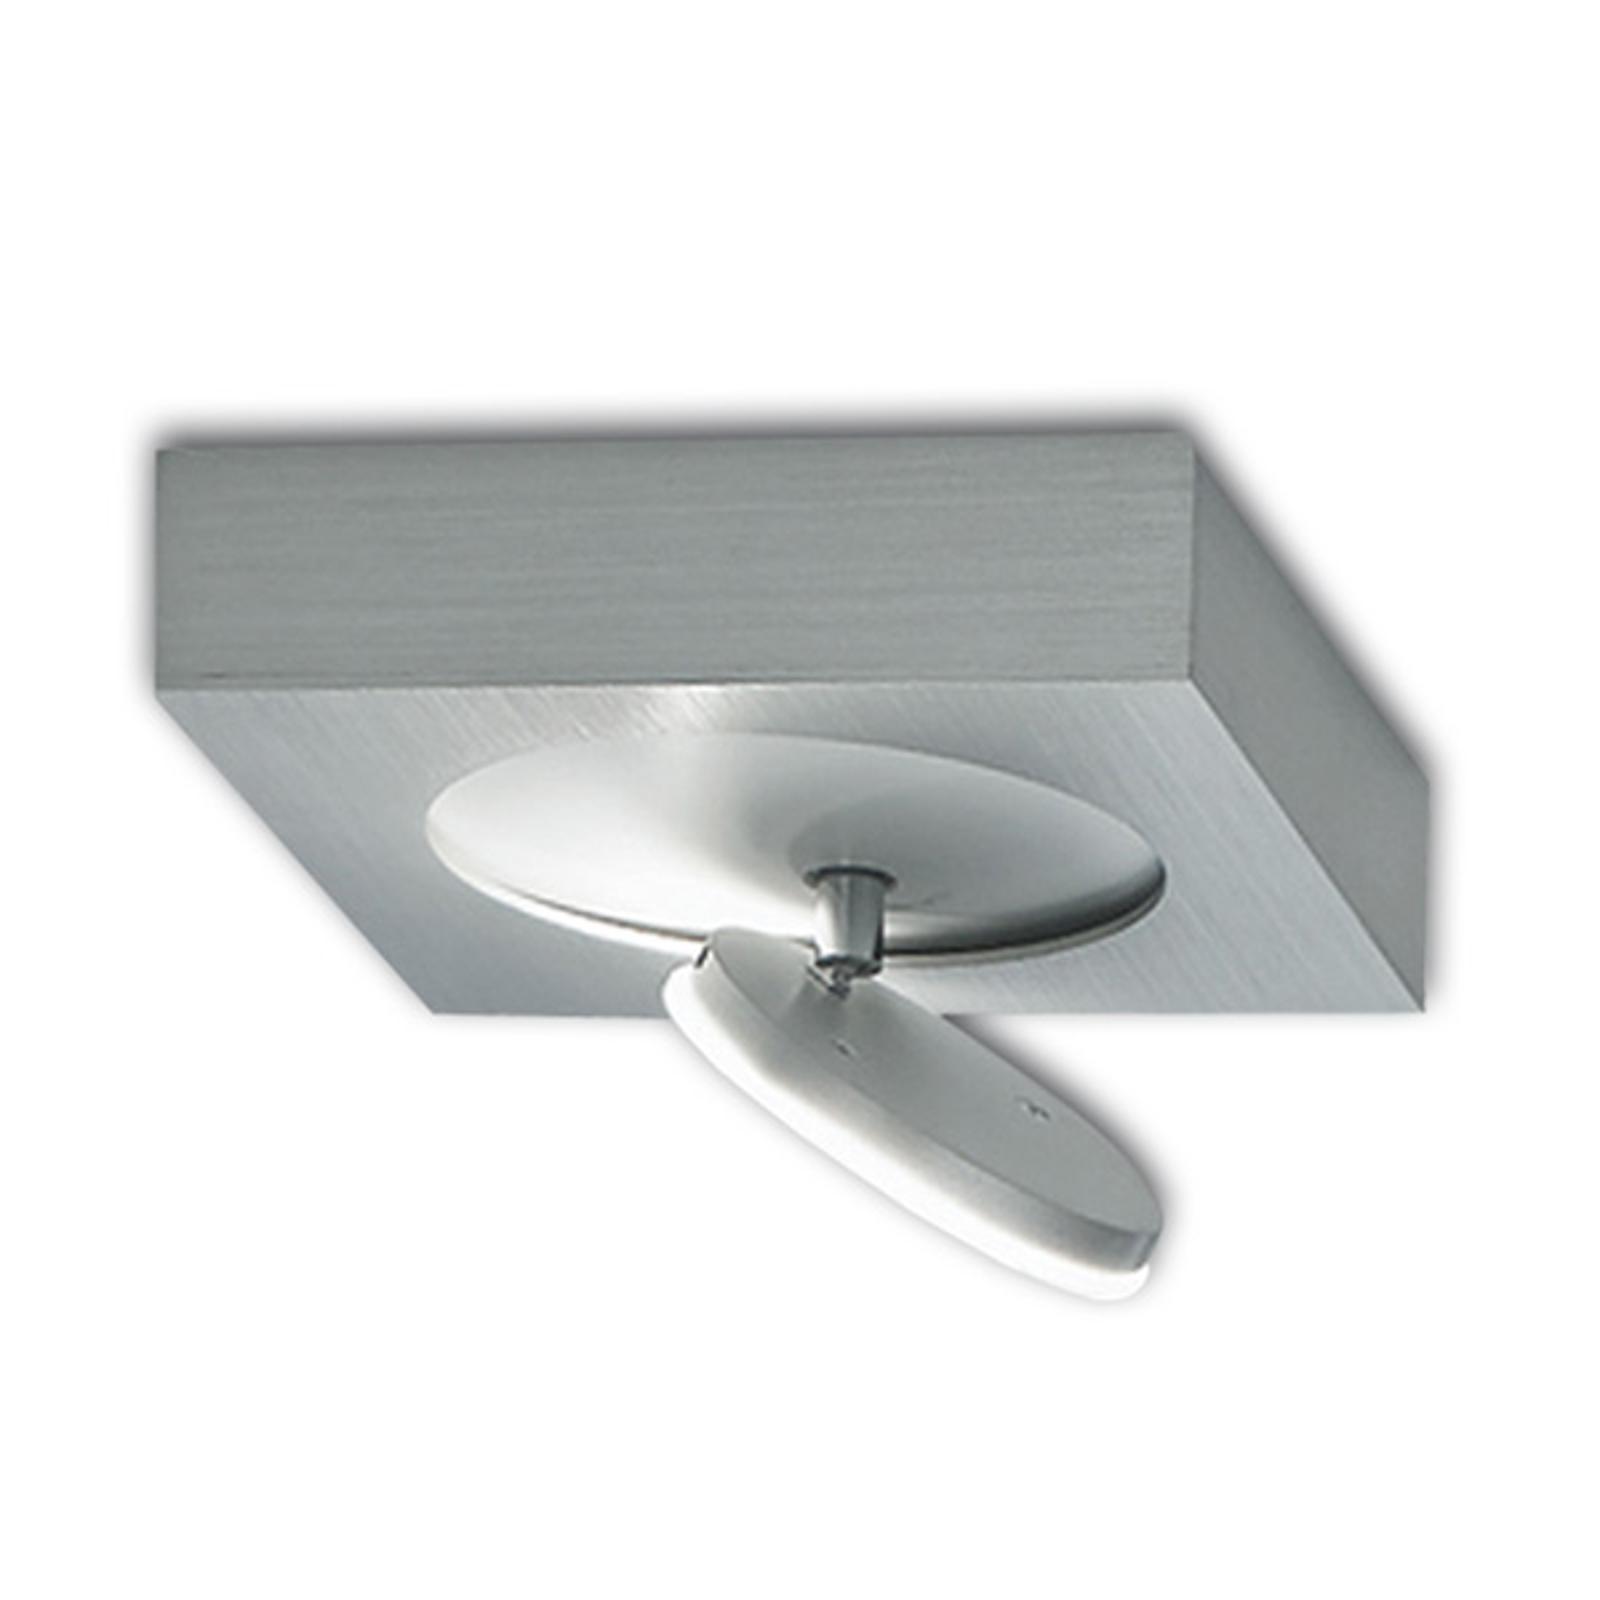 Escale Spot It - LED-takspotlight 1 lampa